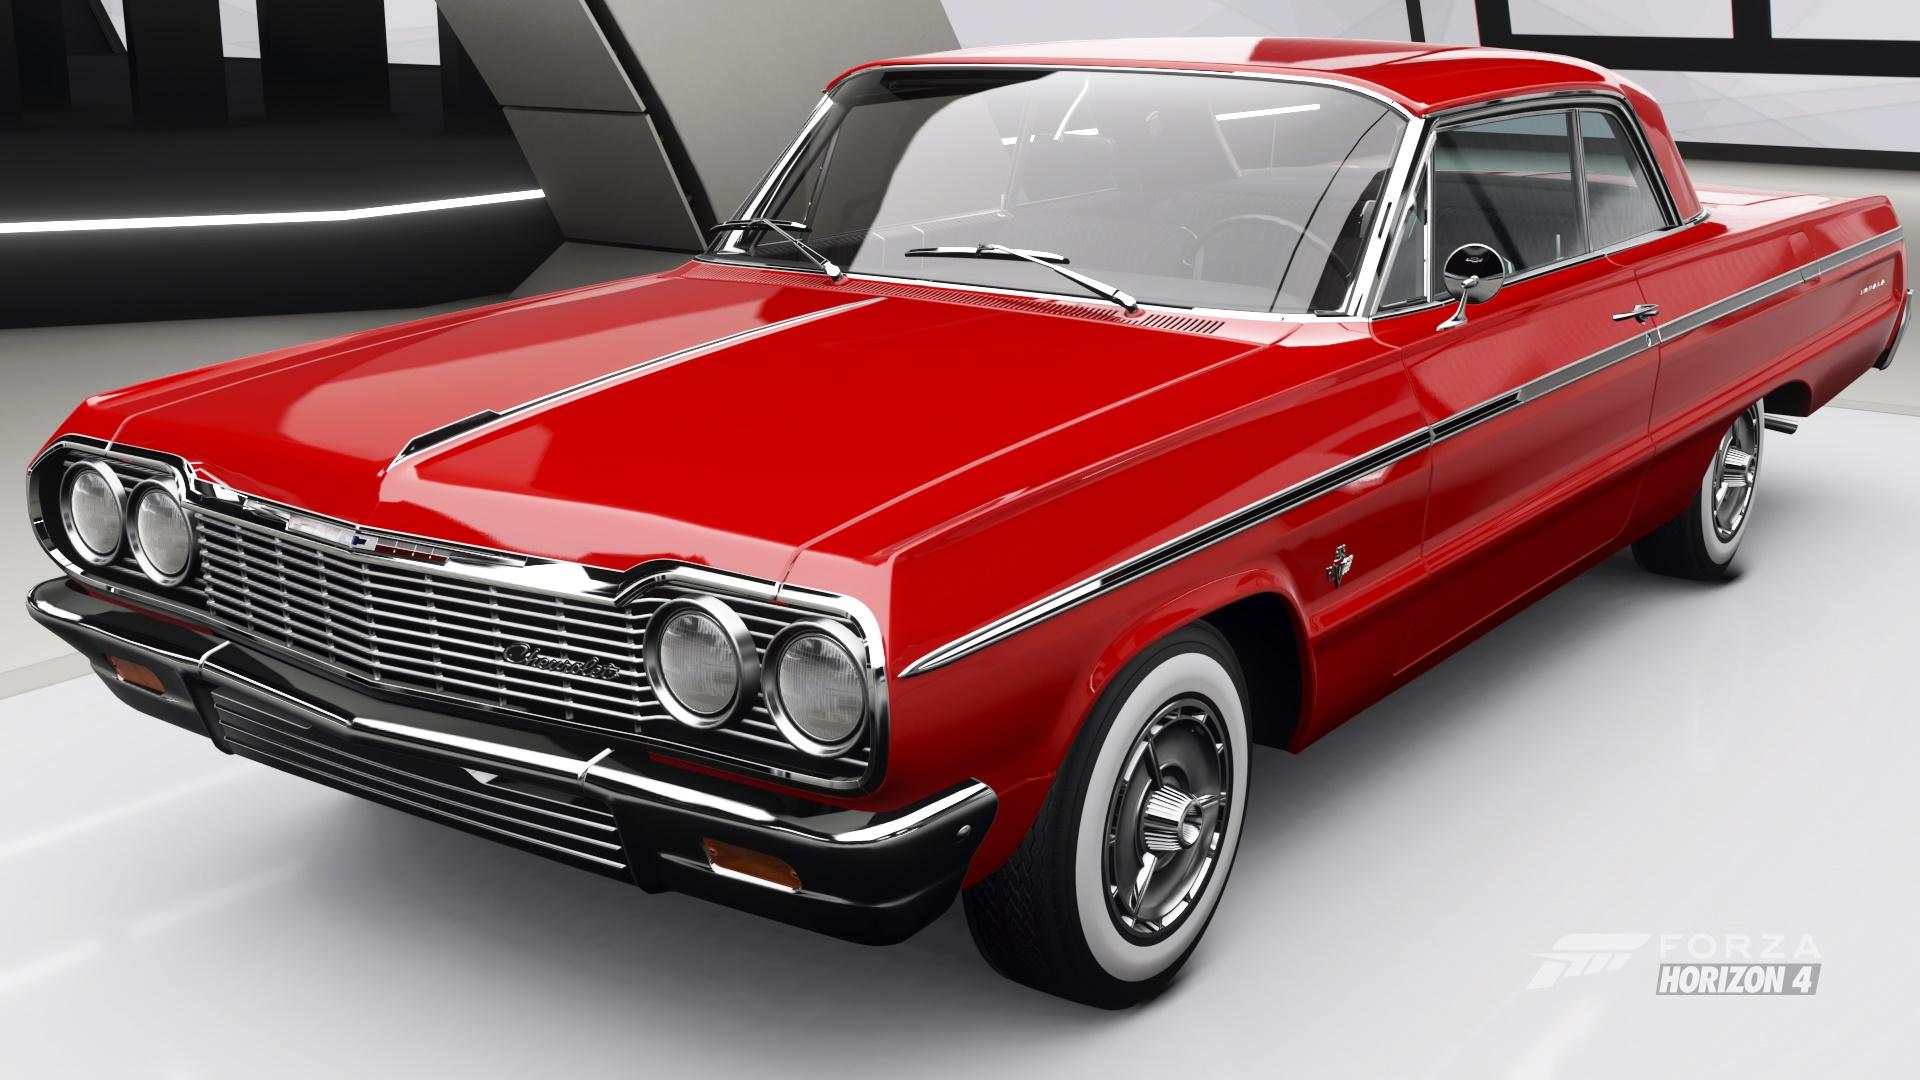 Chevrolet Impala Super Sport 409 Forza Motorsport Wiki